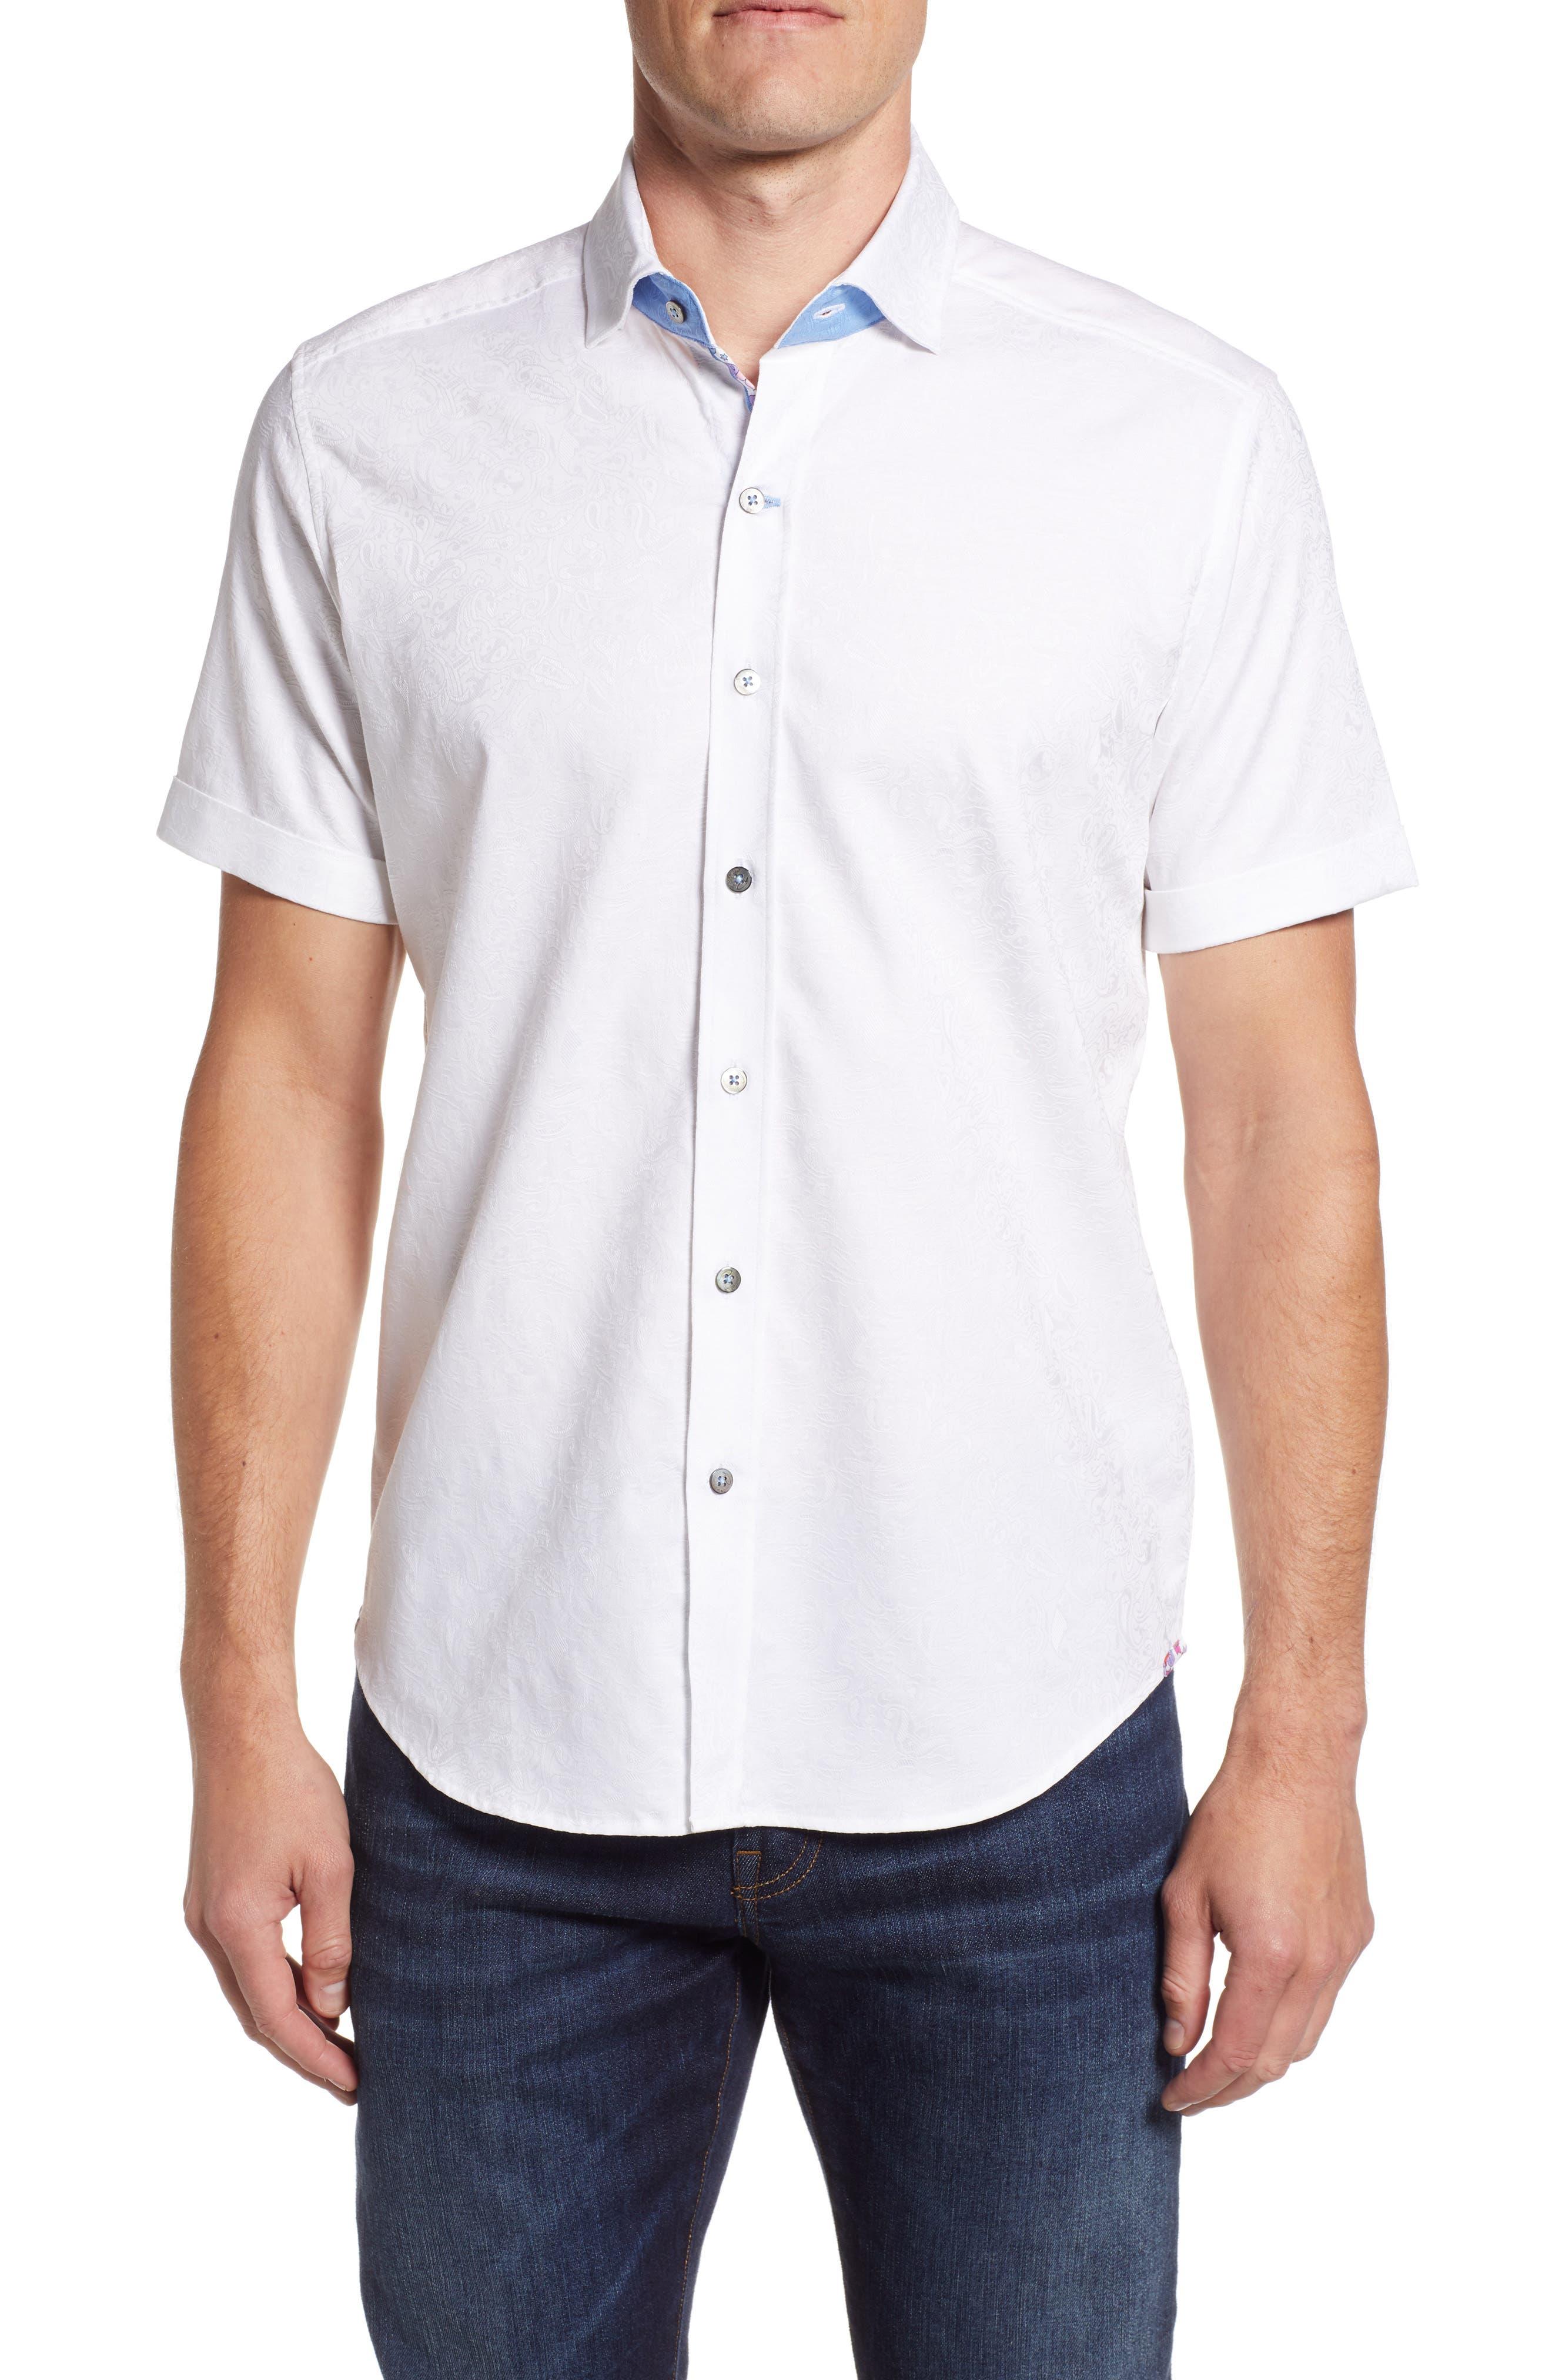 Abbott Sport Shirt,                             Main thumbnail 1, color,                             100